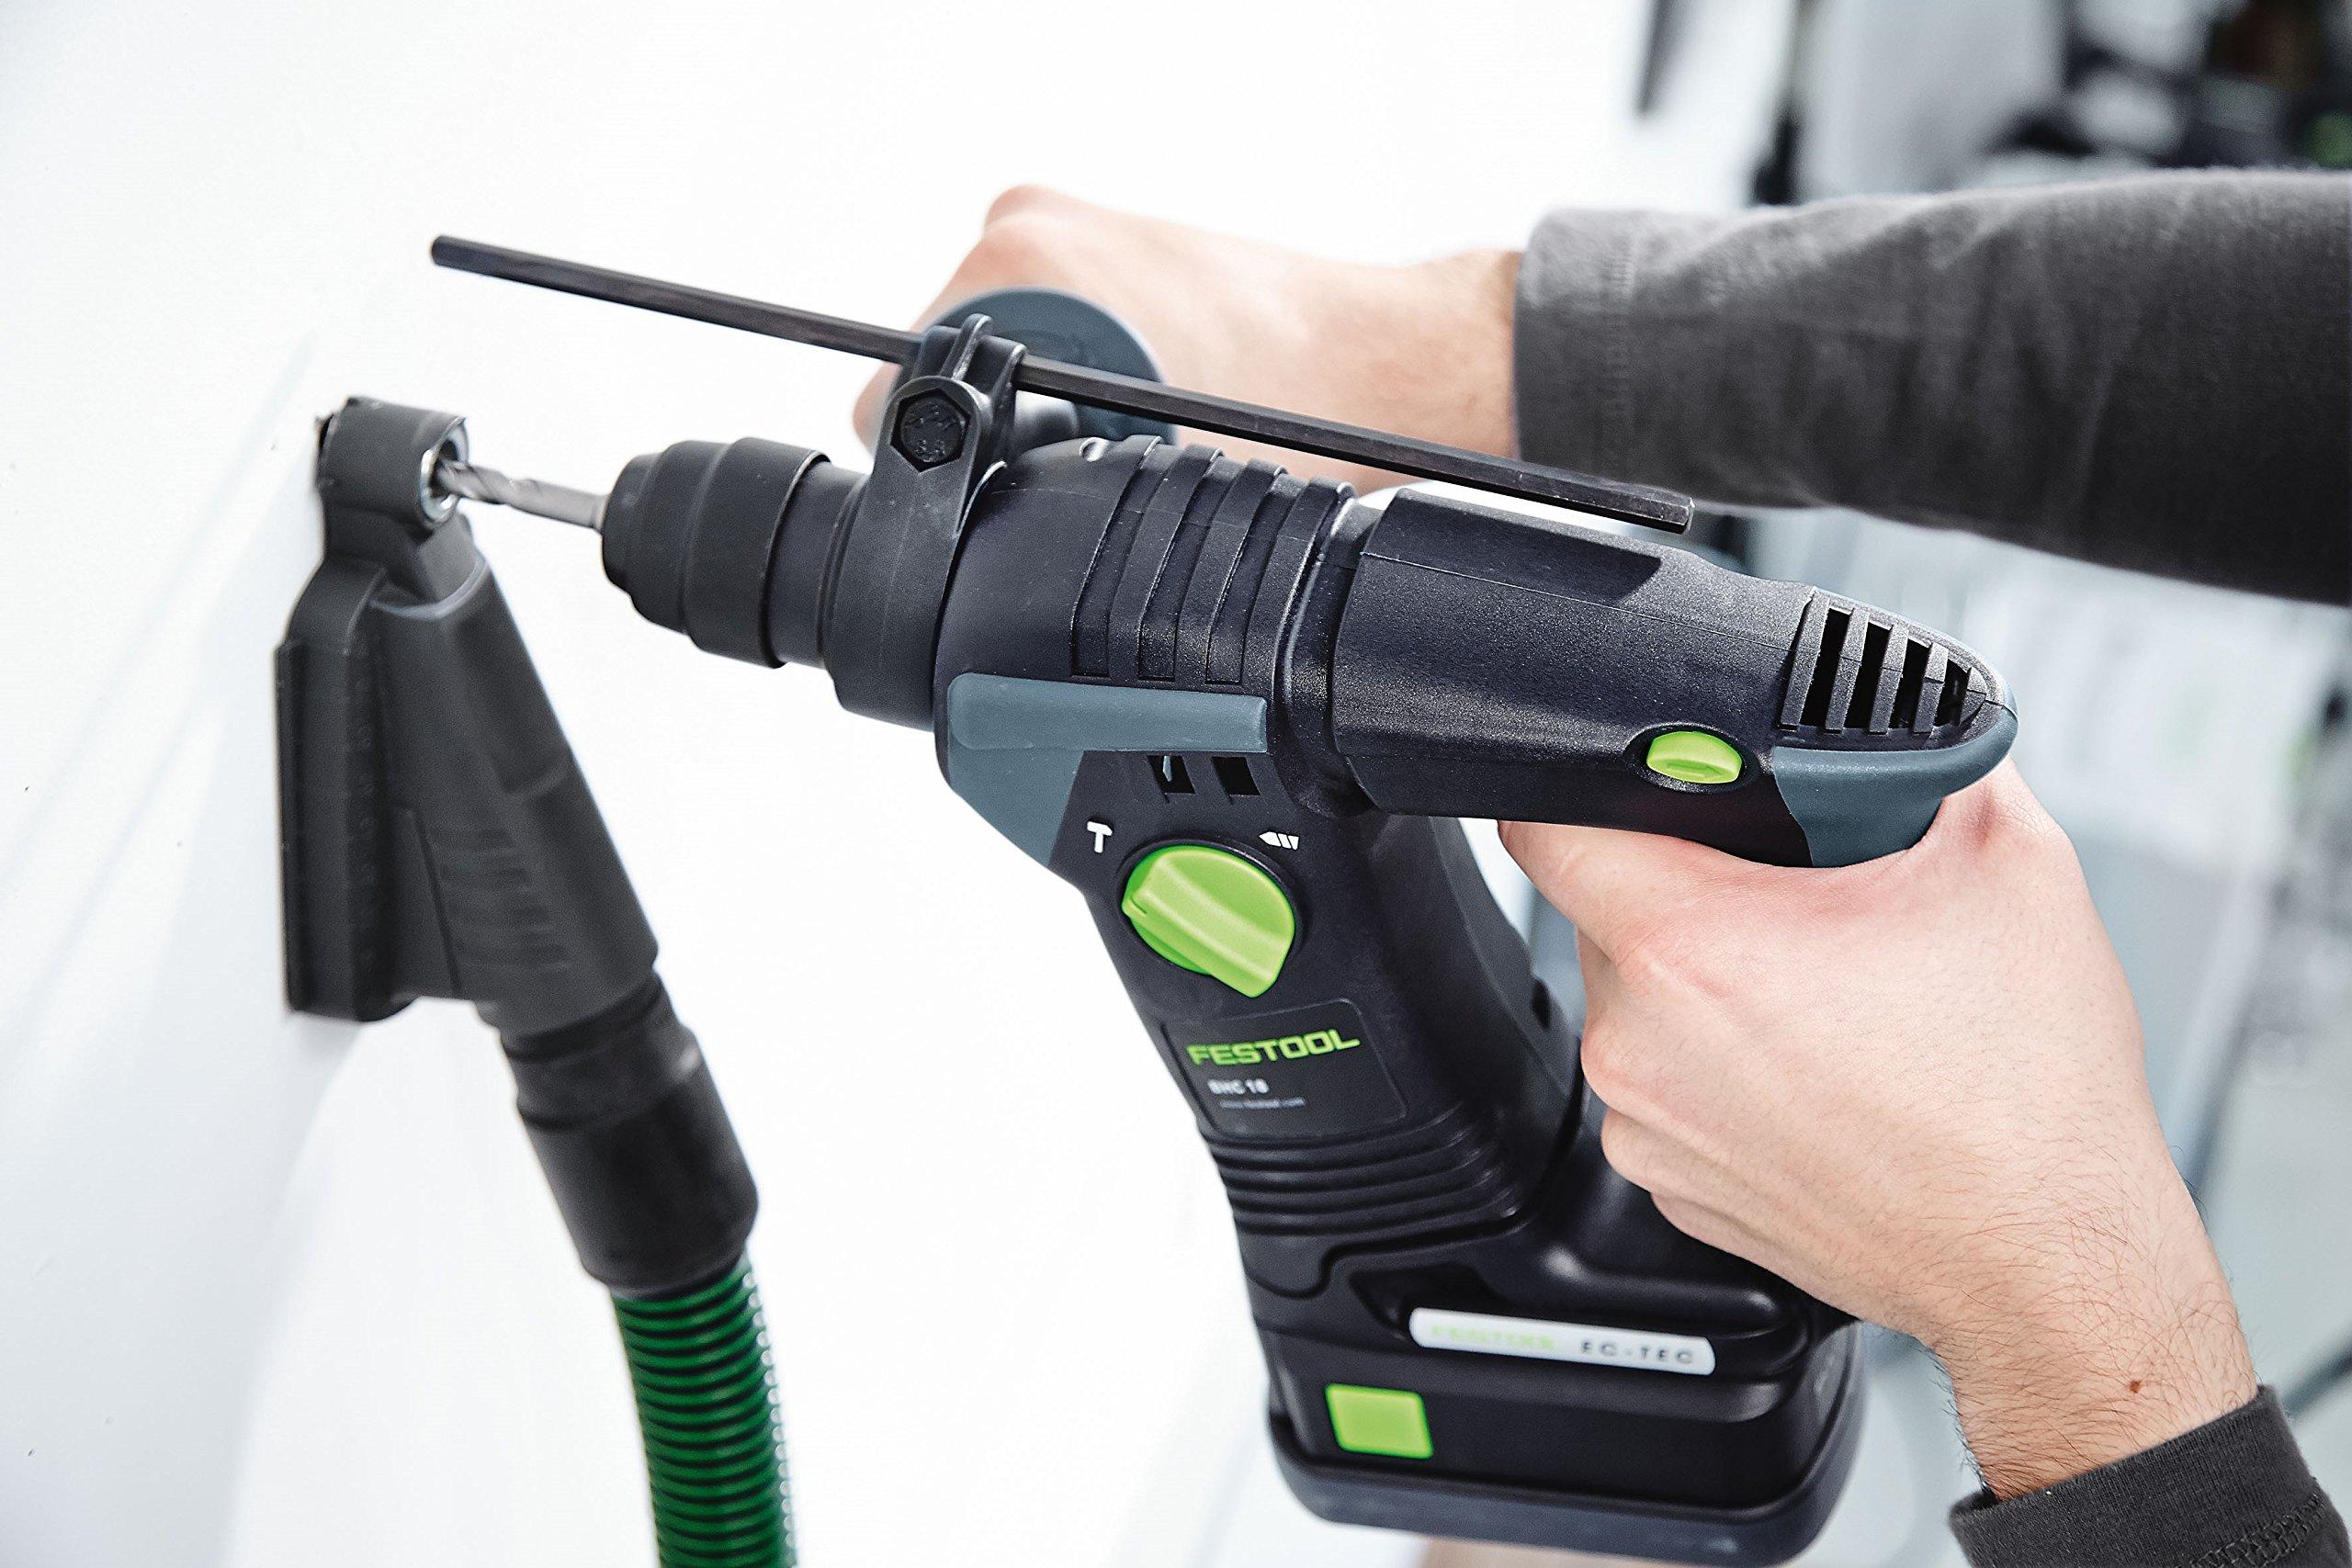 Festool 500483 BHC Drilling Dust Nozzle by Festool (Image #2)